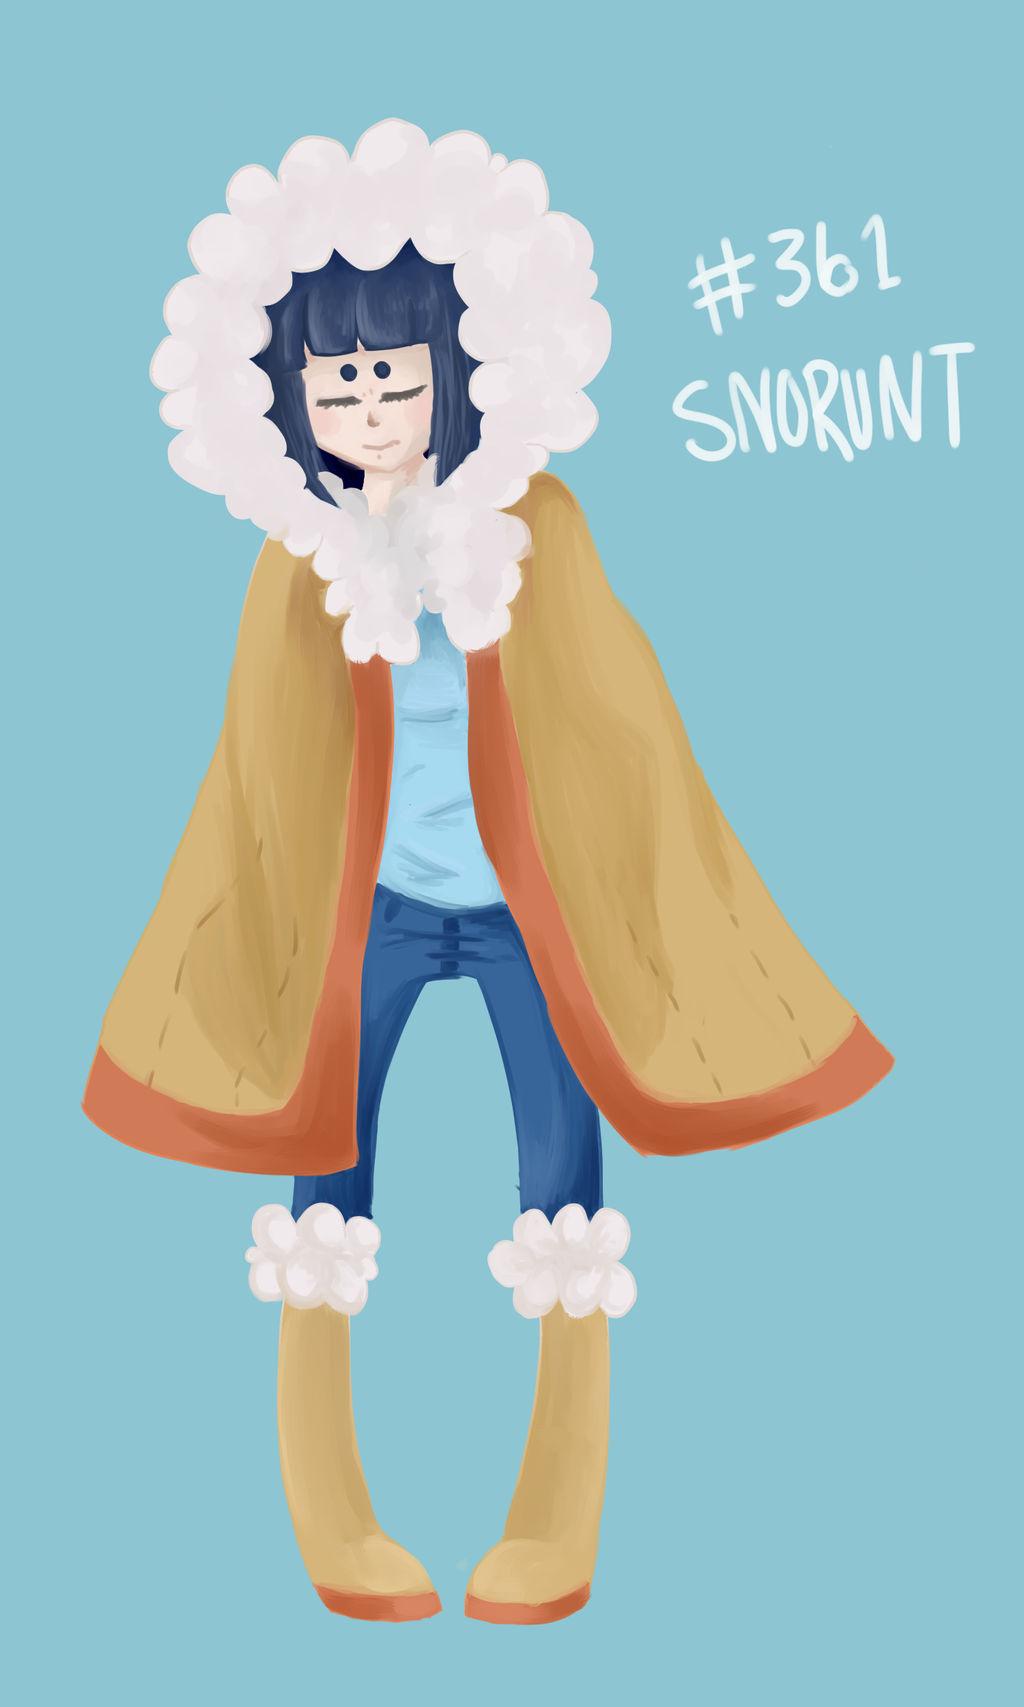 #361 snorunt